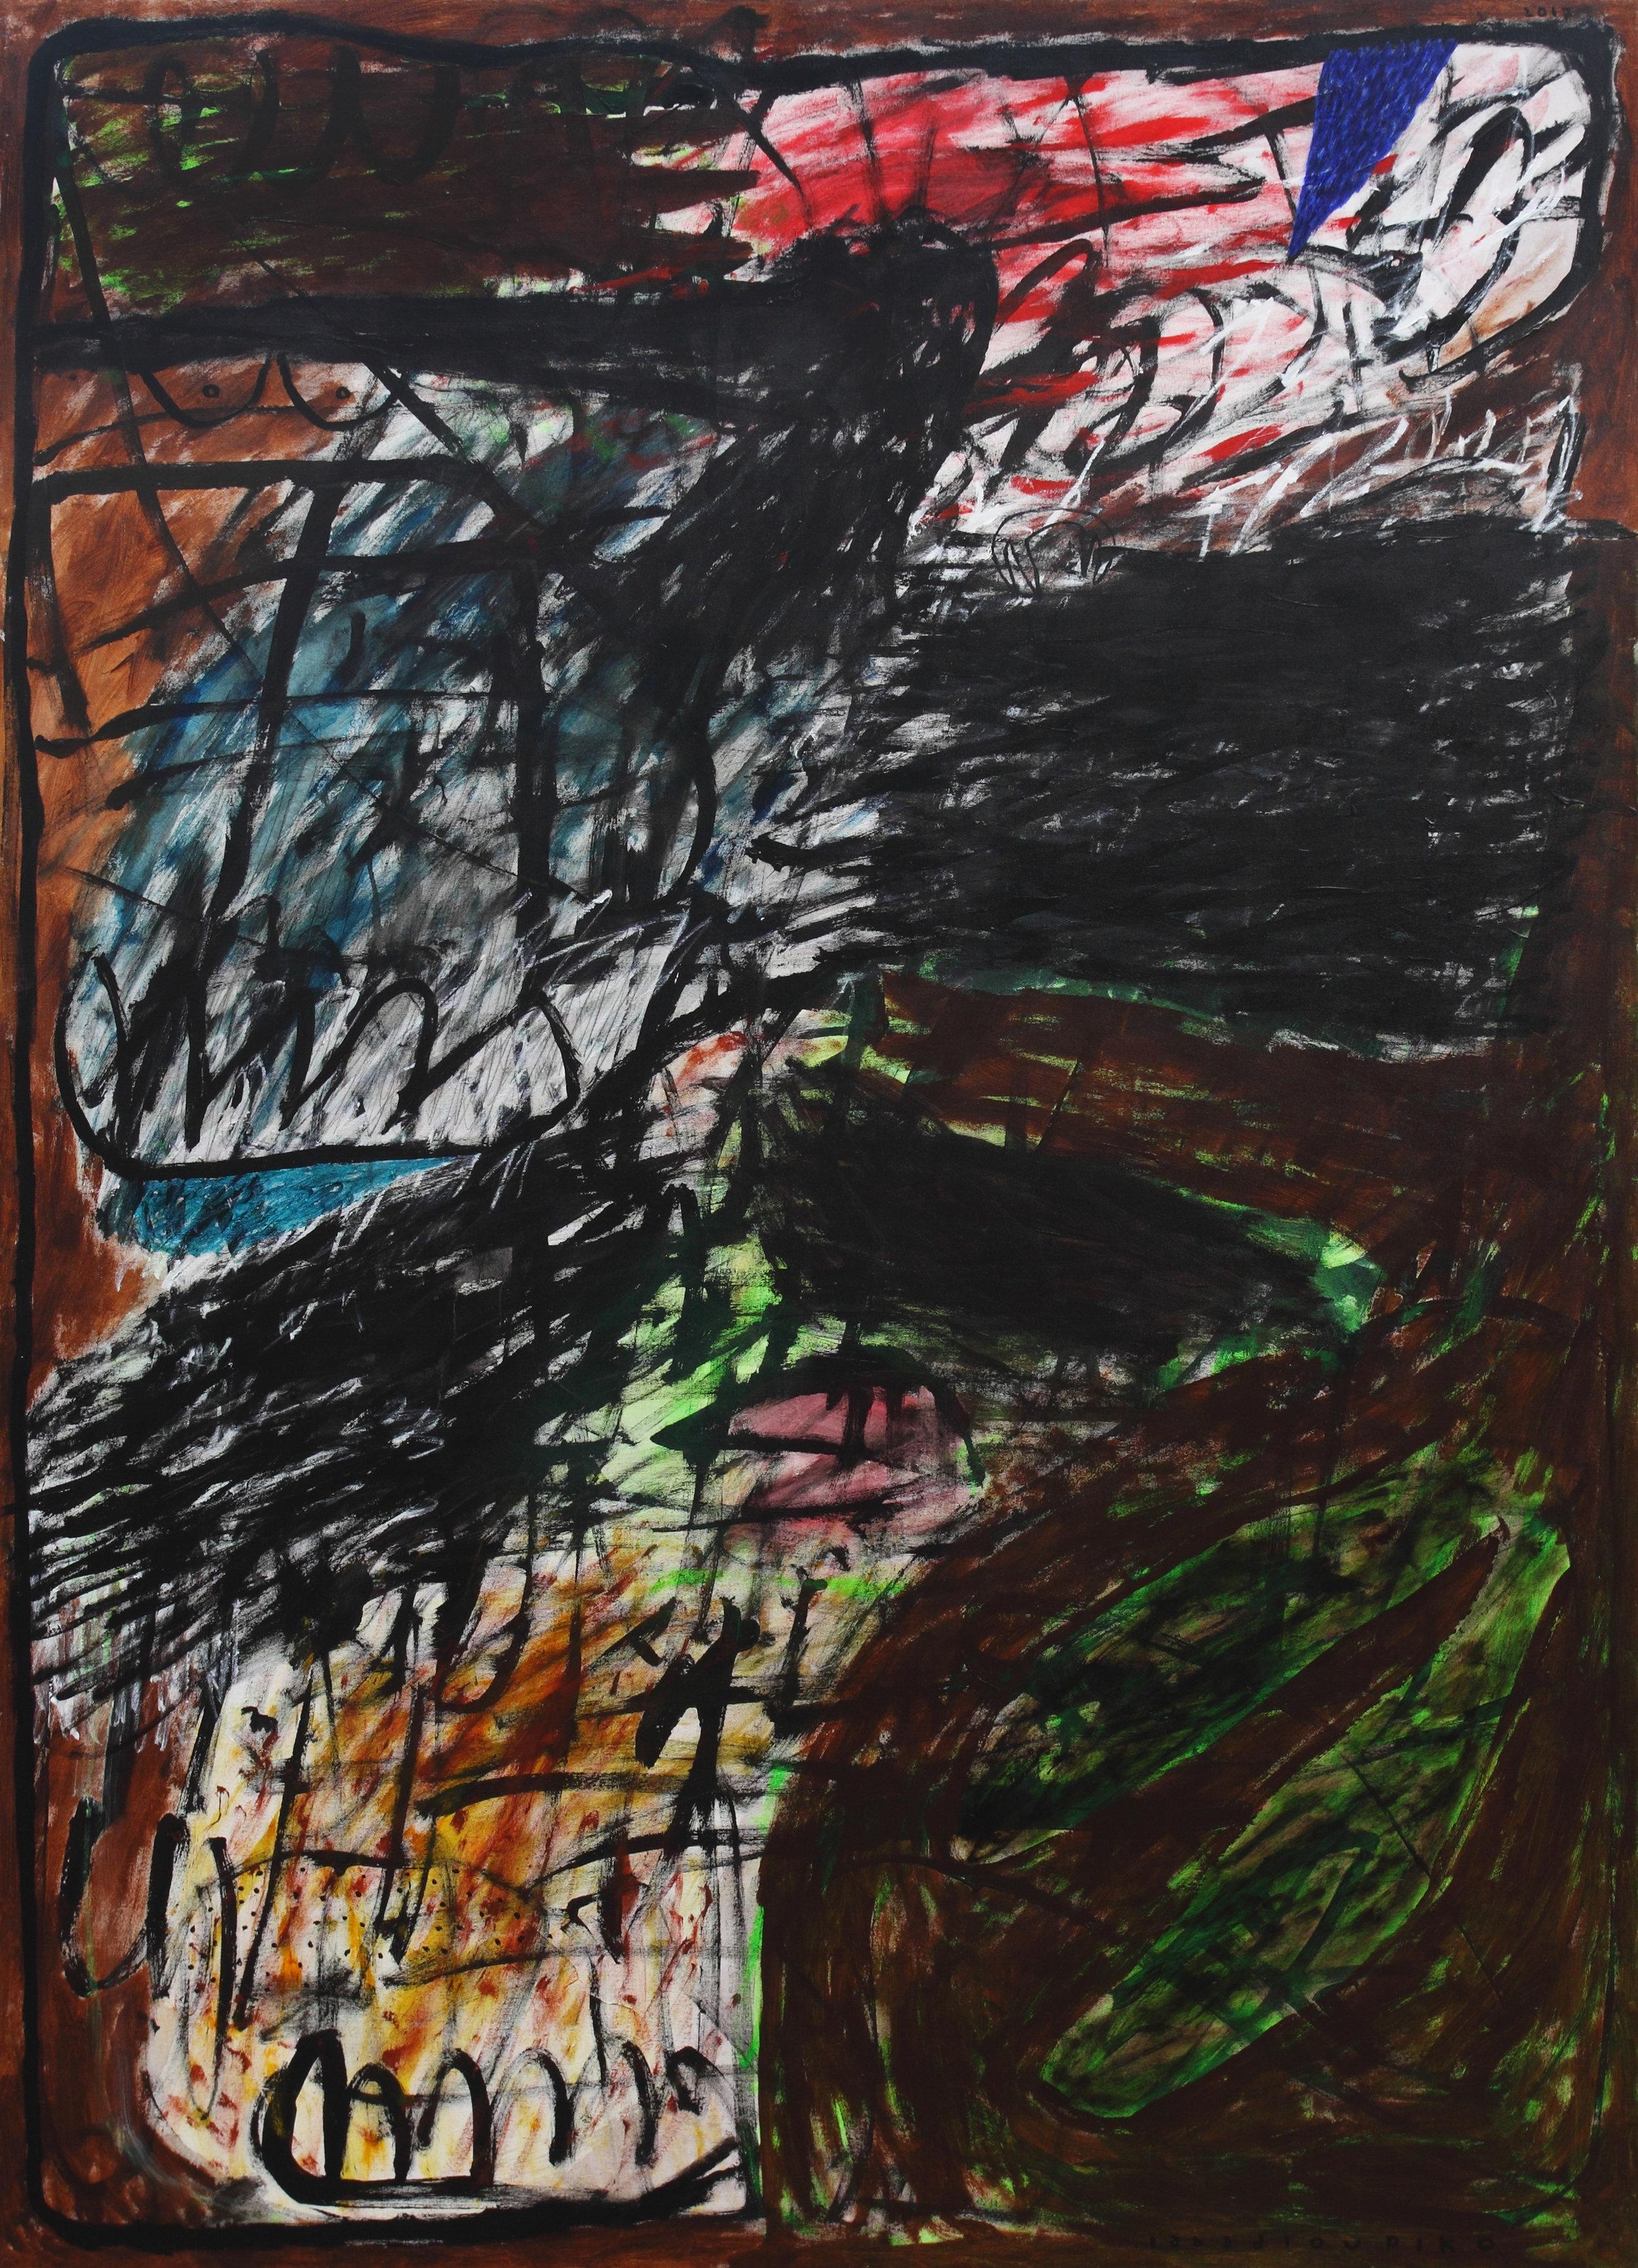 Iabadiou Piko, b.1984 (INDONESIA)  Title: Mengganggu Malam  Medium: Acrylic, Pencil on Canvas  Dimension: 200 x 145 cm  Year: 2017